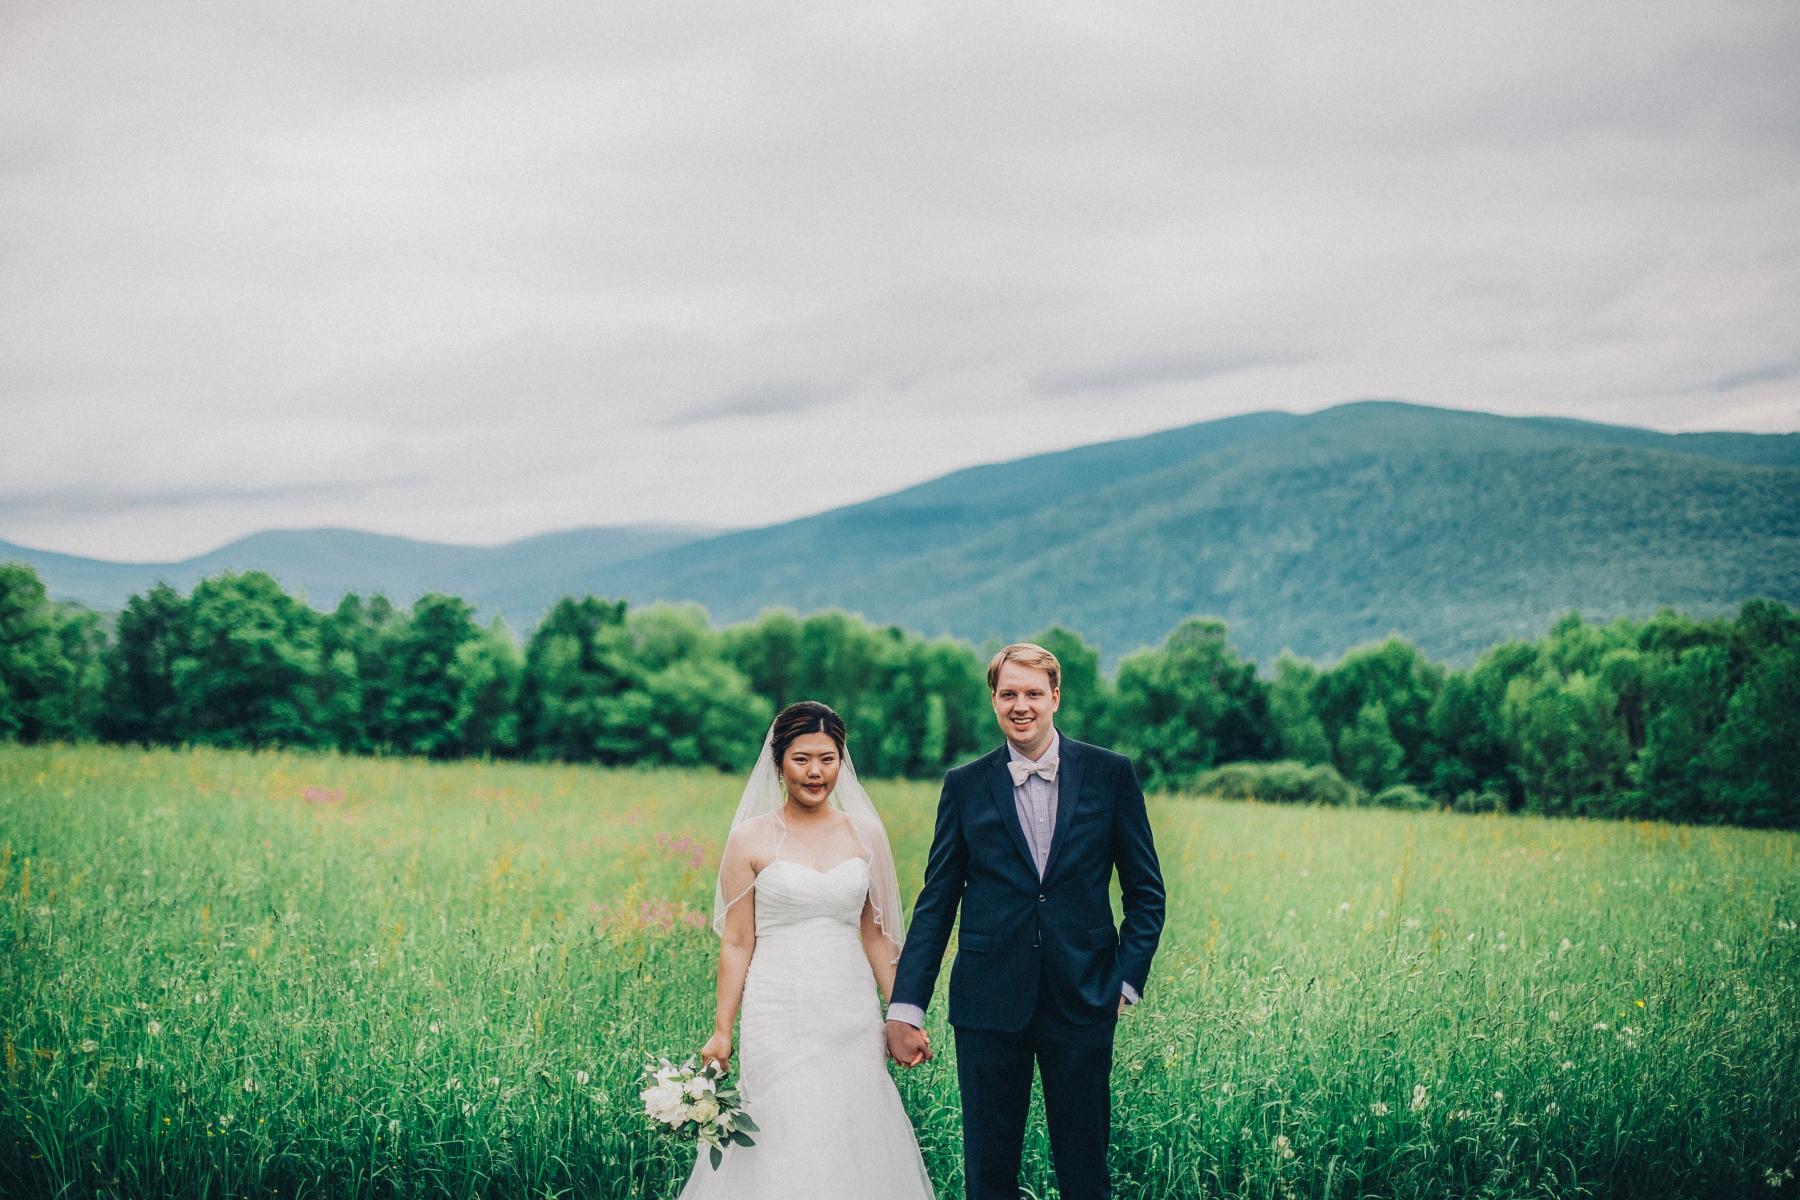 Hasol&Aaron_wedding_0621.JPG